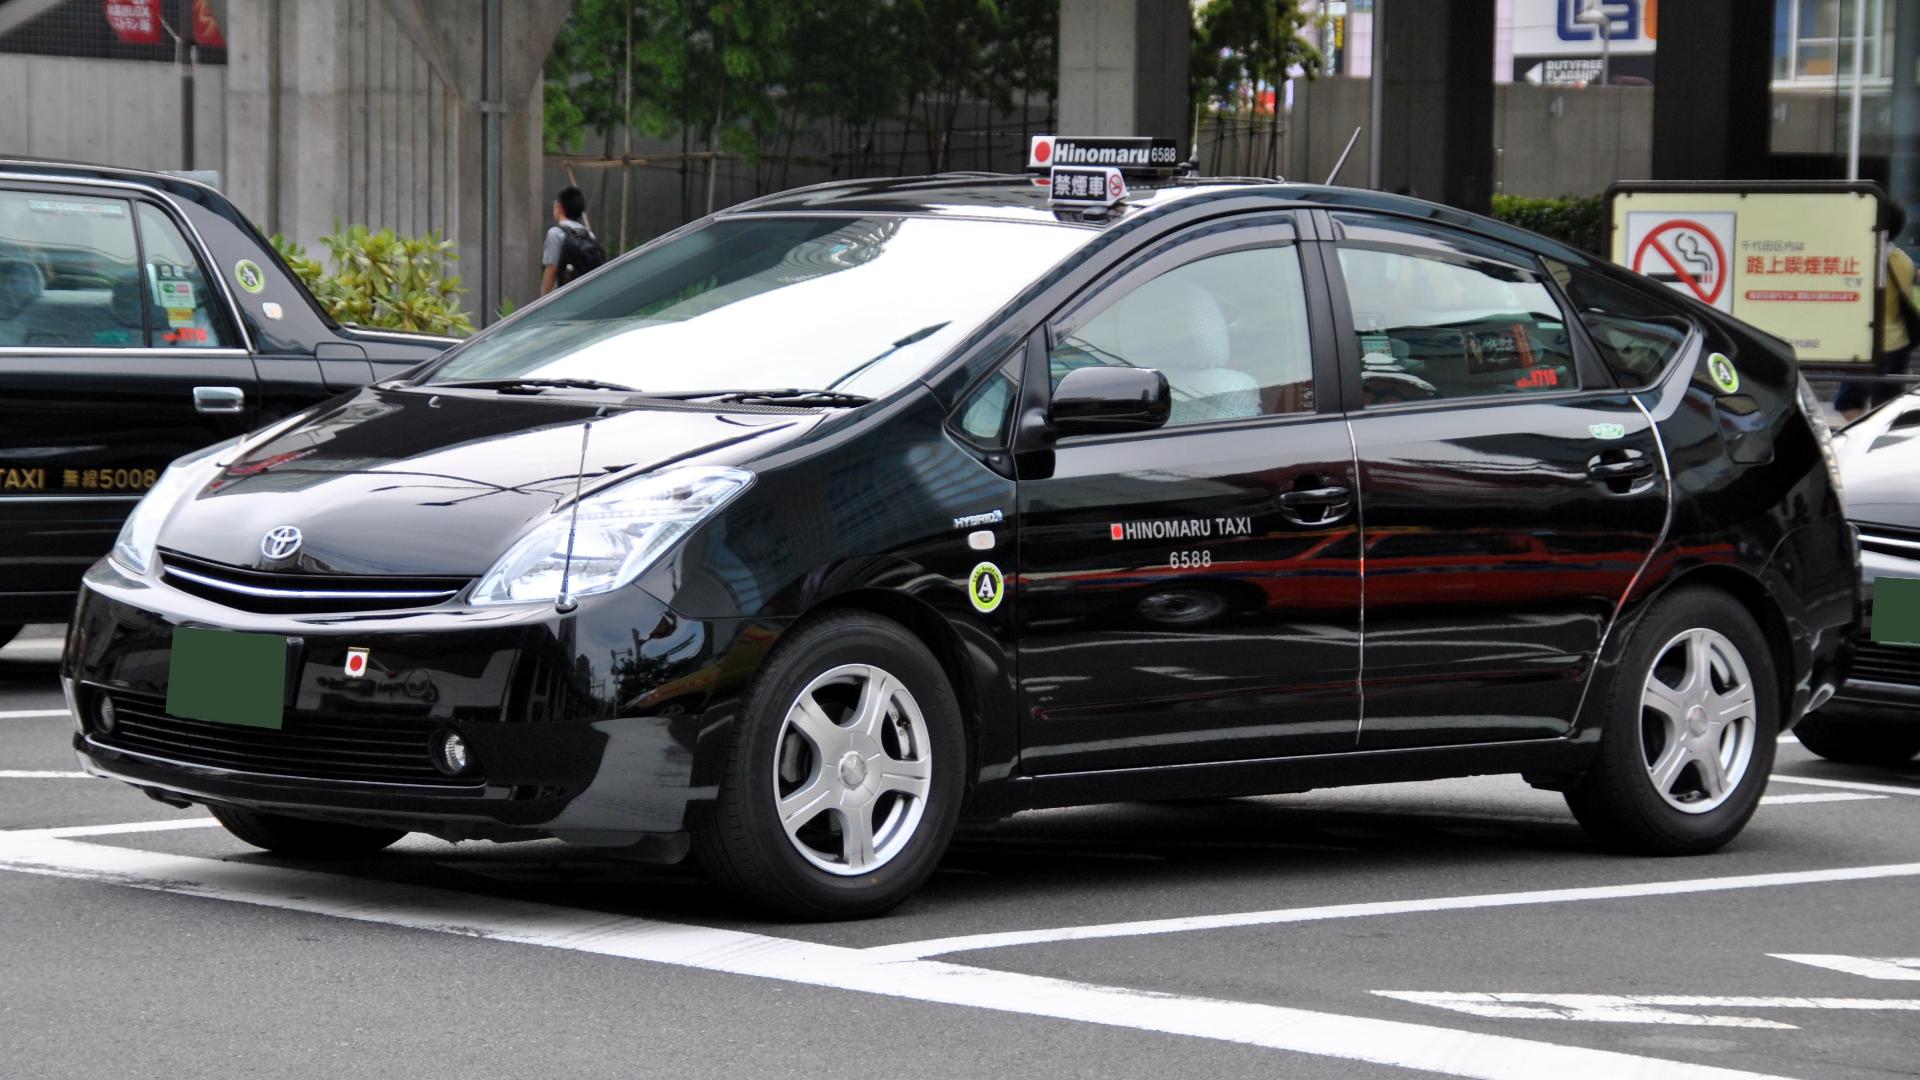 File:Toyota Prius Hinomaru Taxi.JPG - Wikimedia Commons